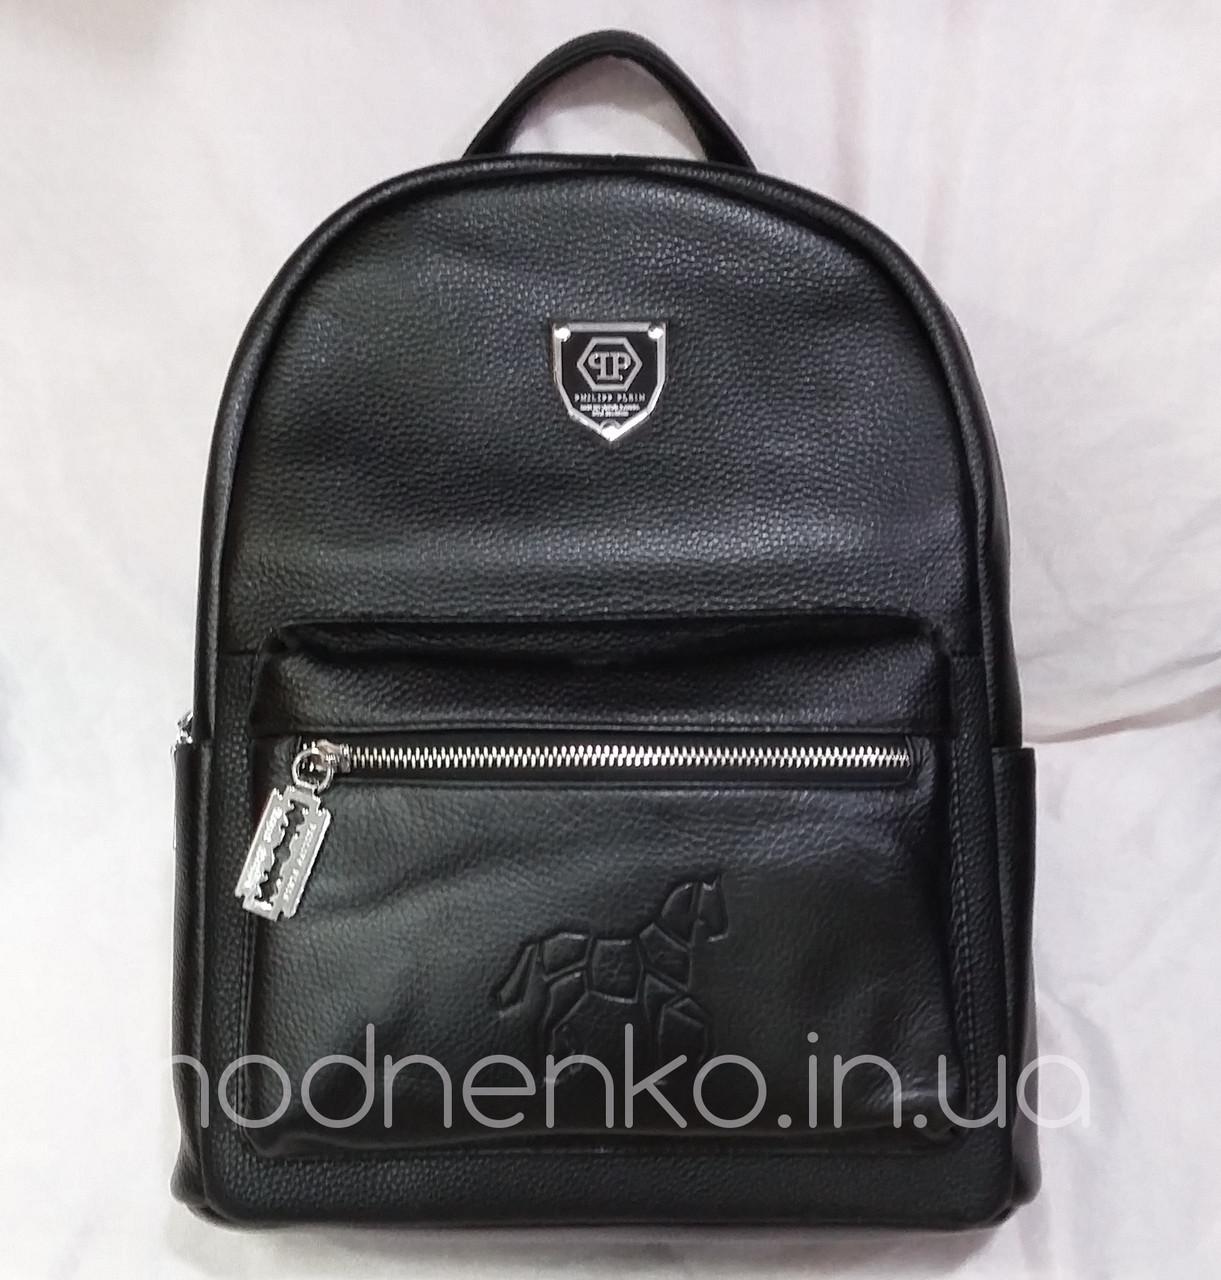 6ba0b4fe4083 Рюкзак Philipp Plein унисекс (натуральная кожа): продажа, цена в ...